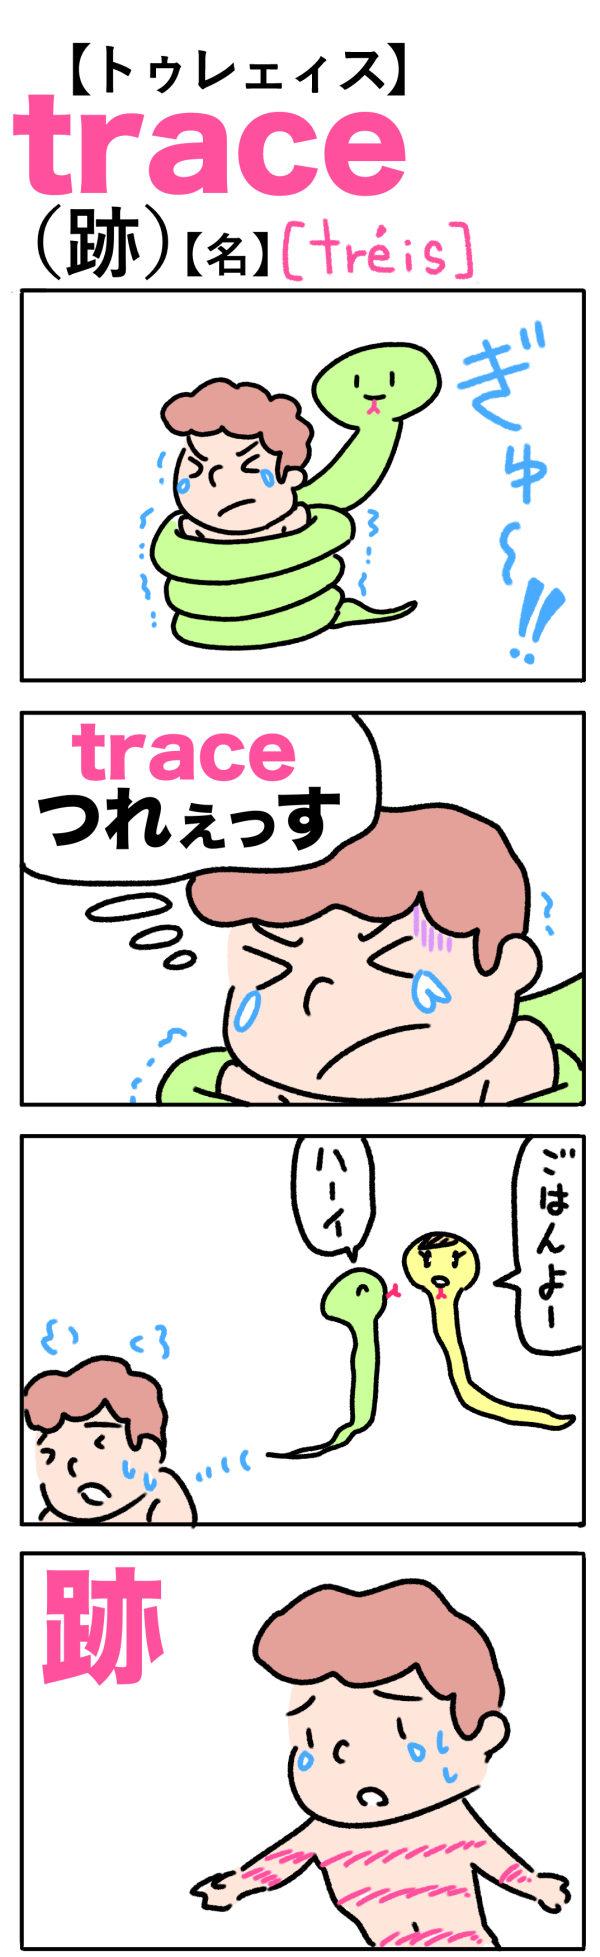 trace(跡)の語呂合わせ英単語